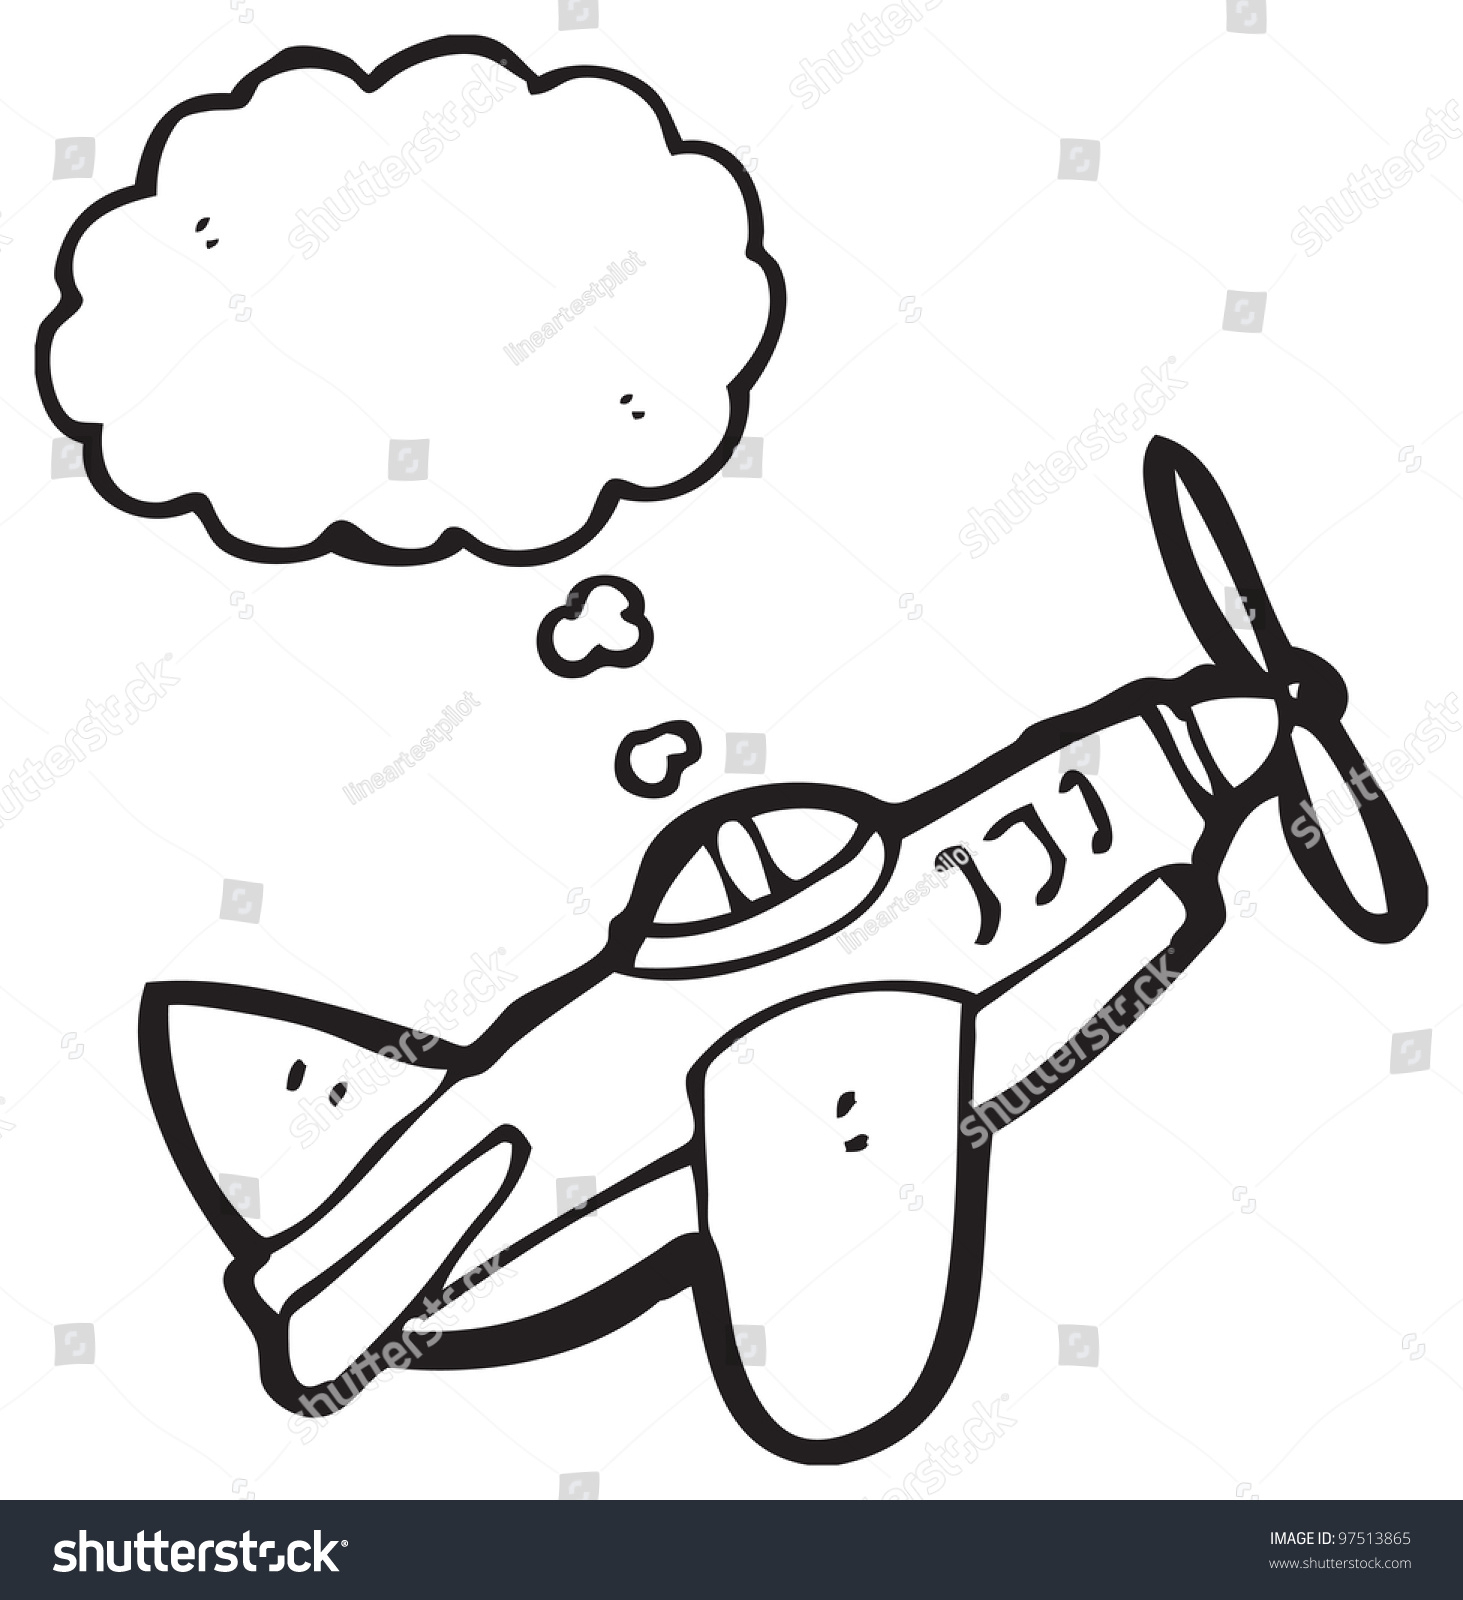 1463x1600 Cartoon Airplane Drawing